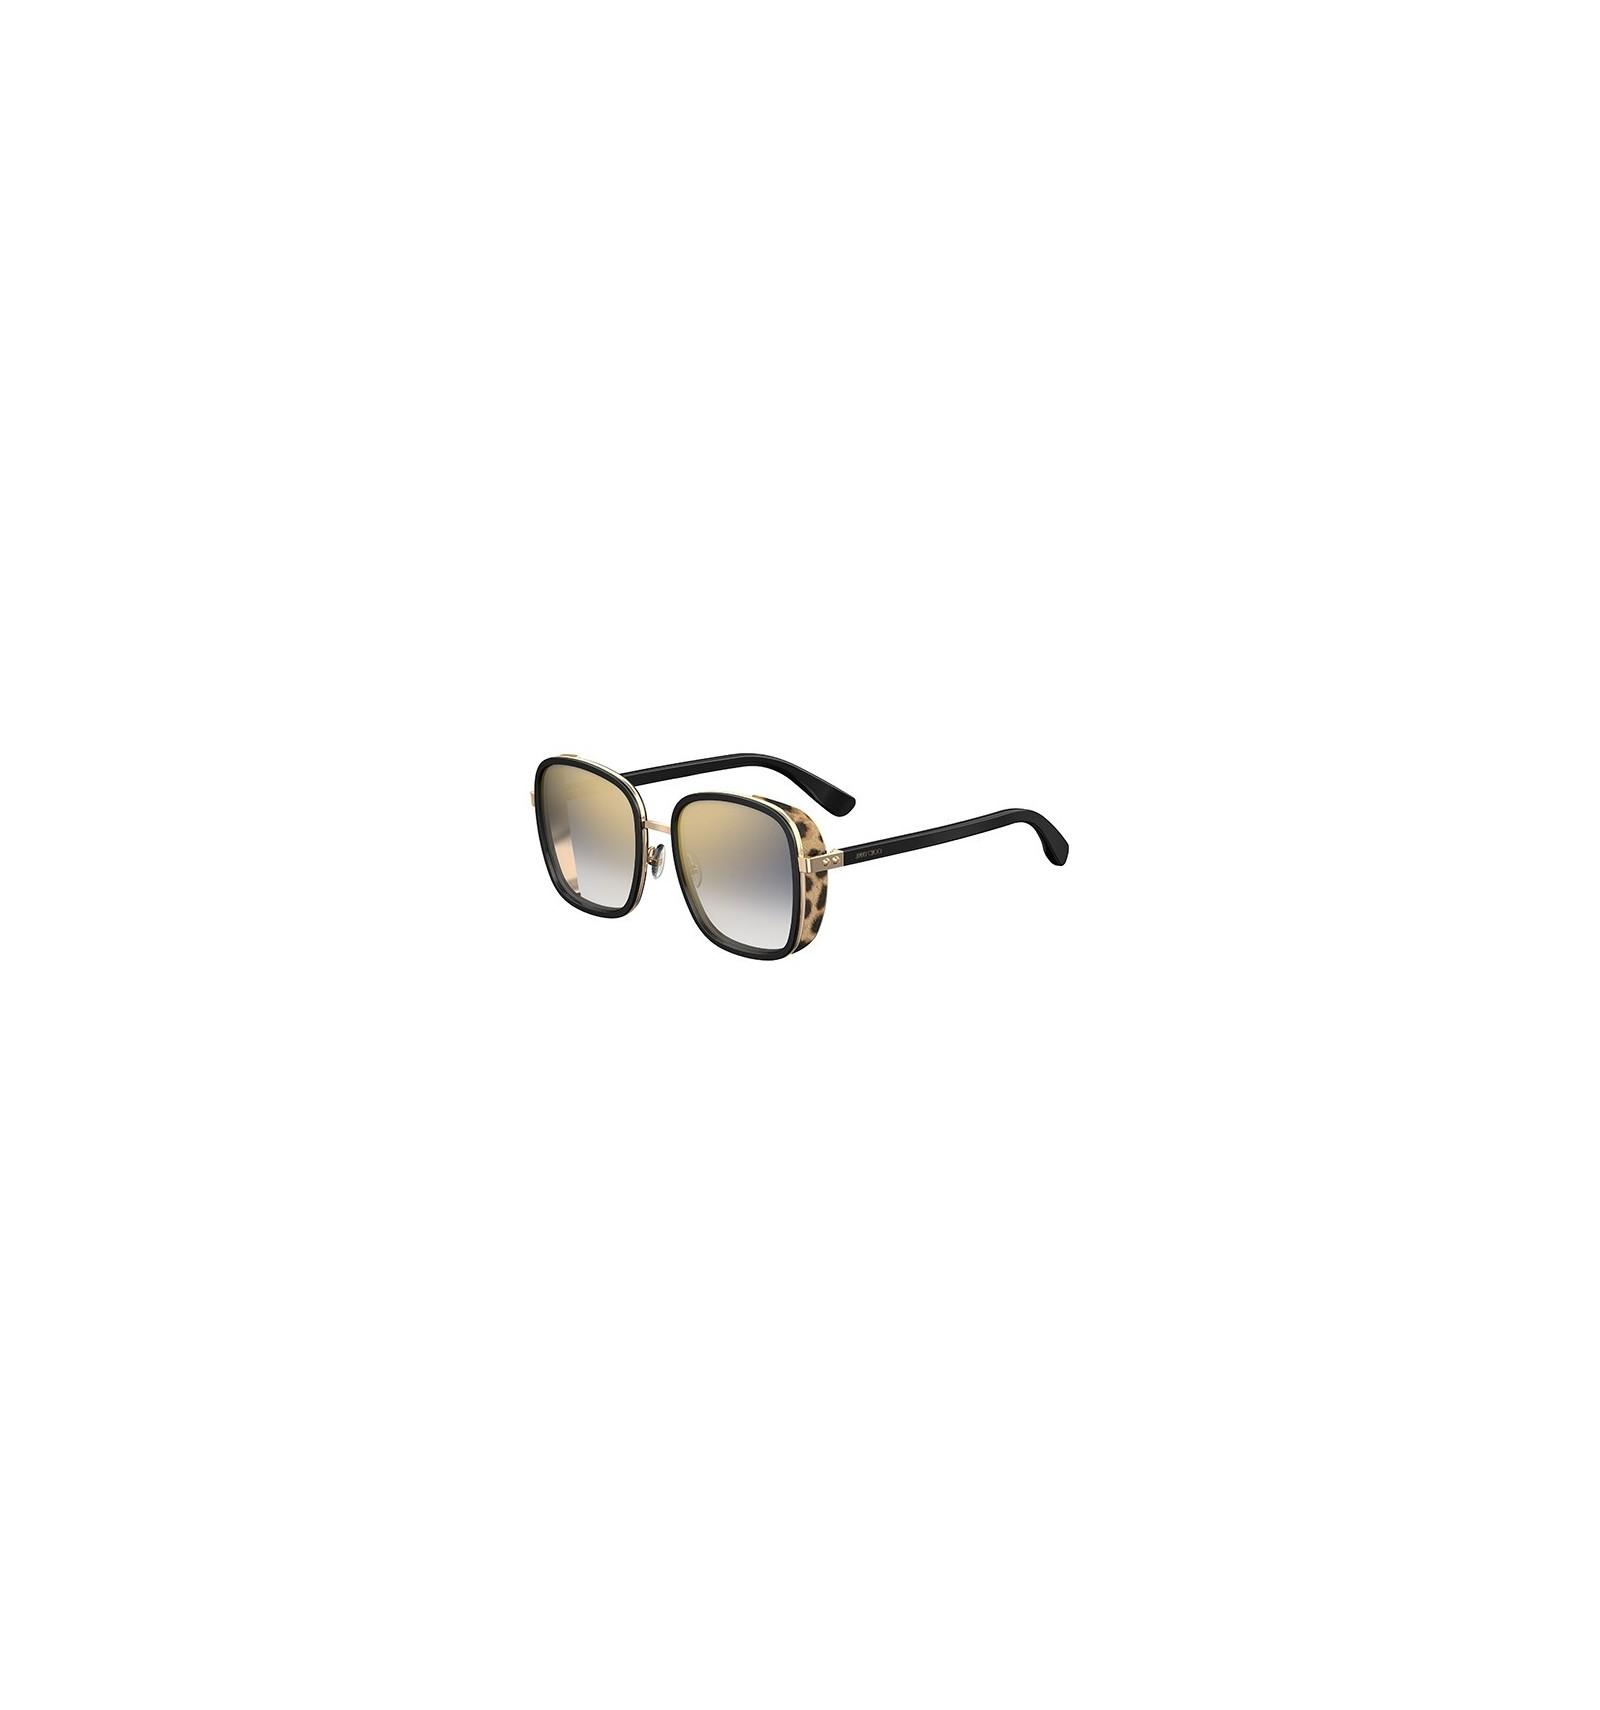 5b3fa5e6e5 Gafas de sol JIMMY CHOO ELVA Black Animal Print - Gold Grey Shaded (FP3-